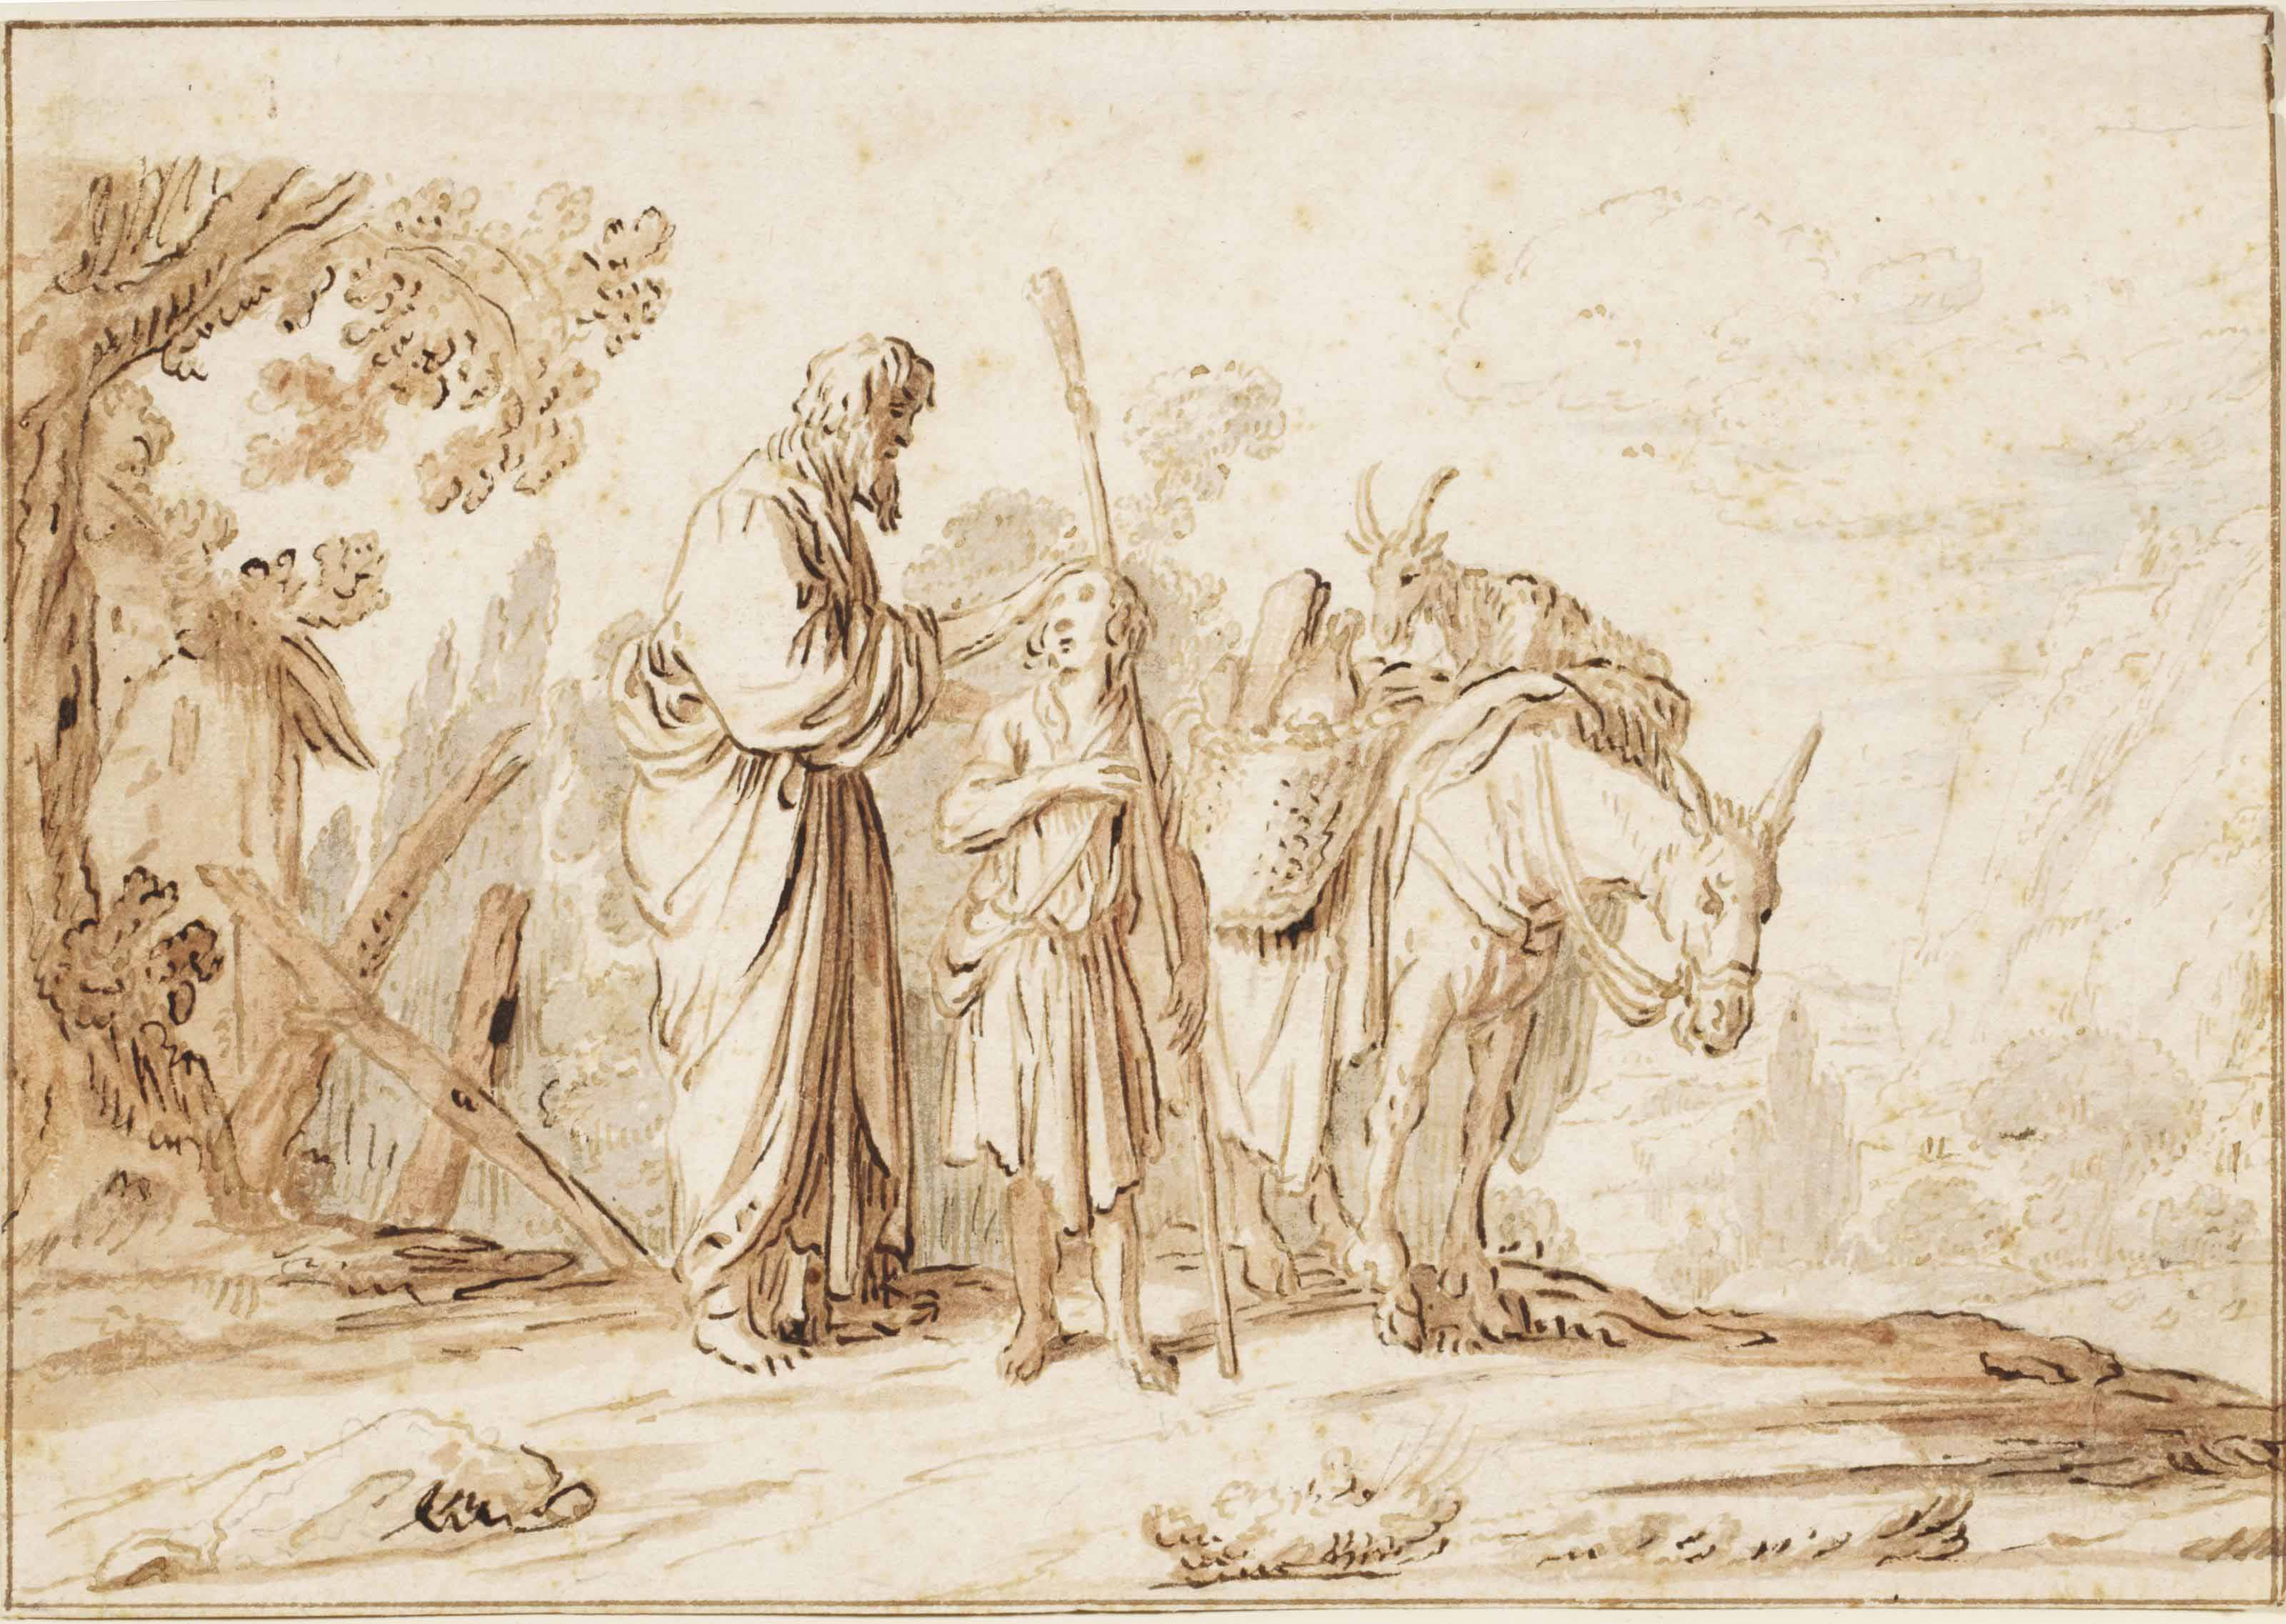 Isaiah sending David to Saul